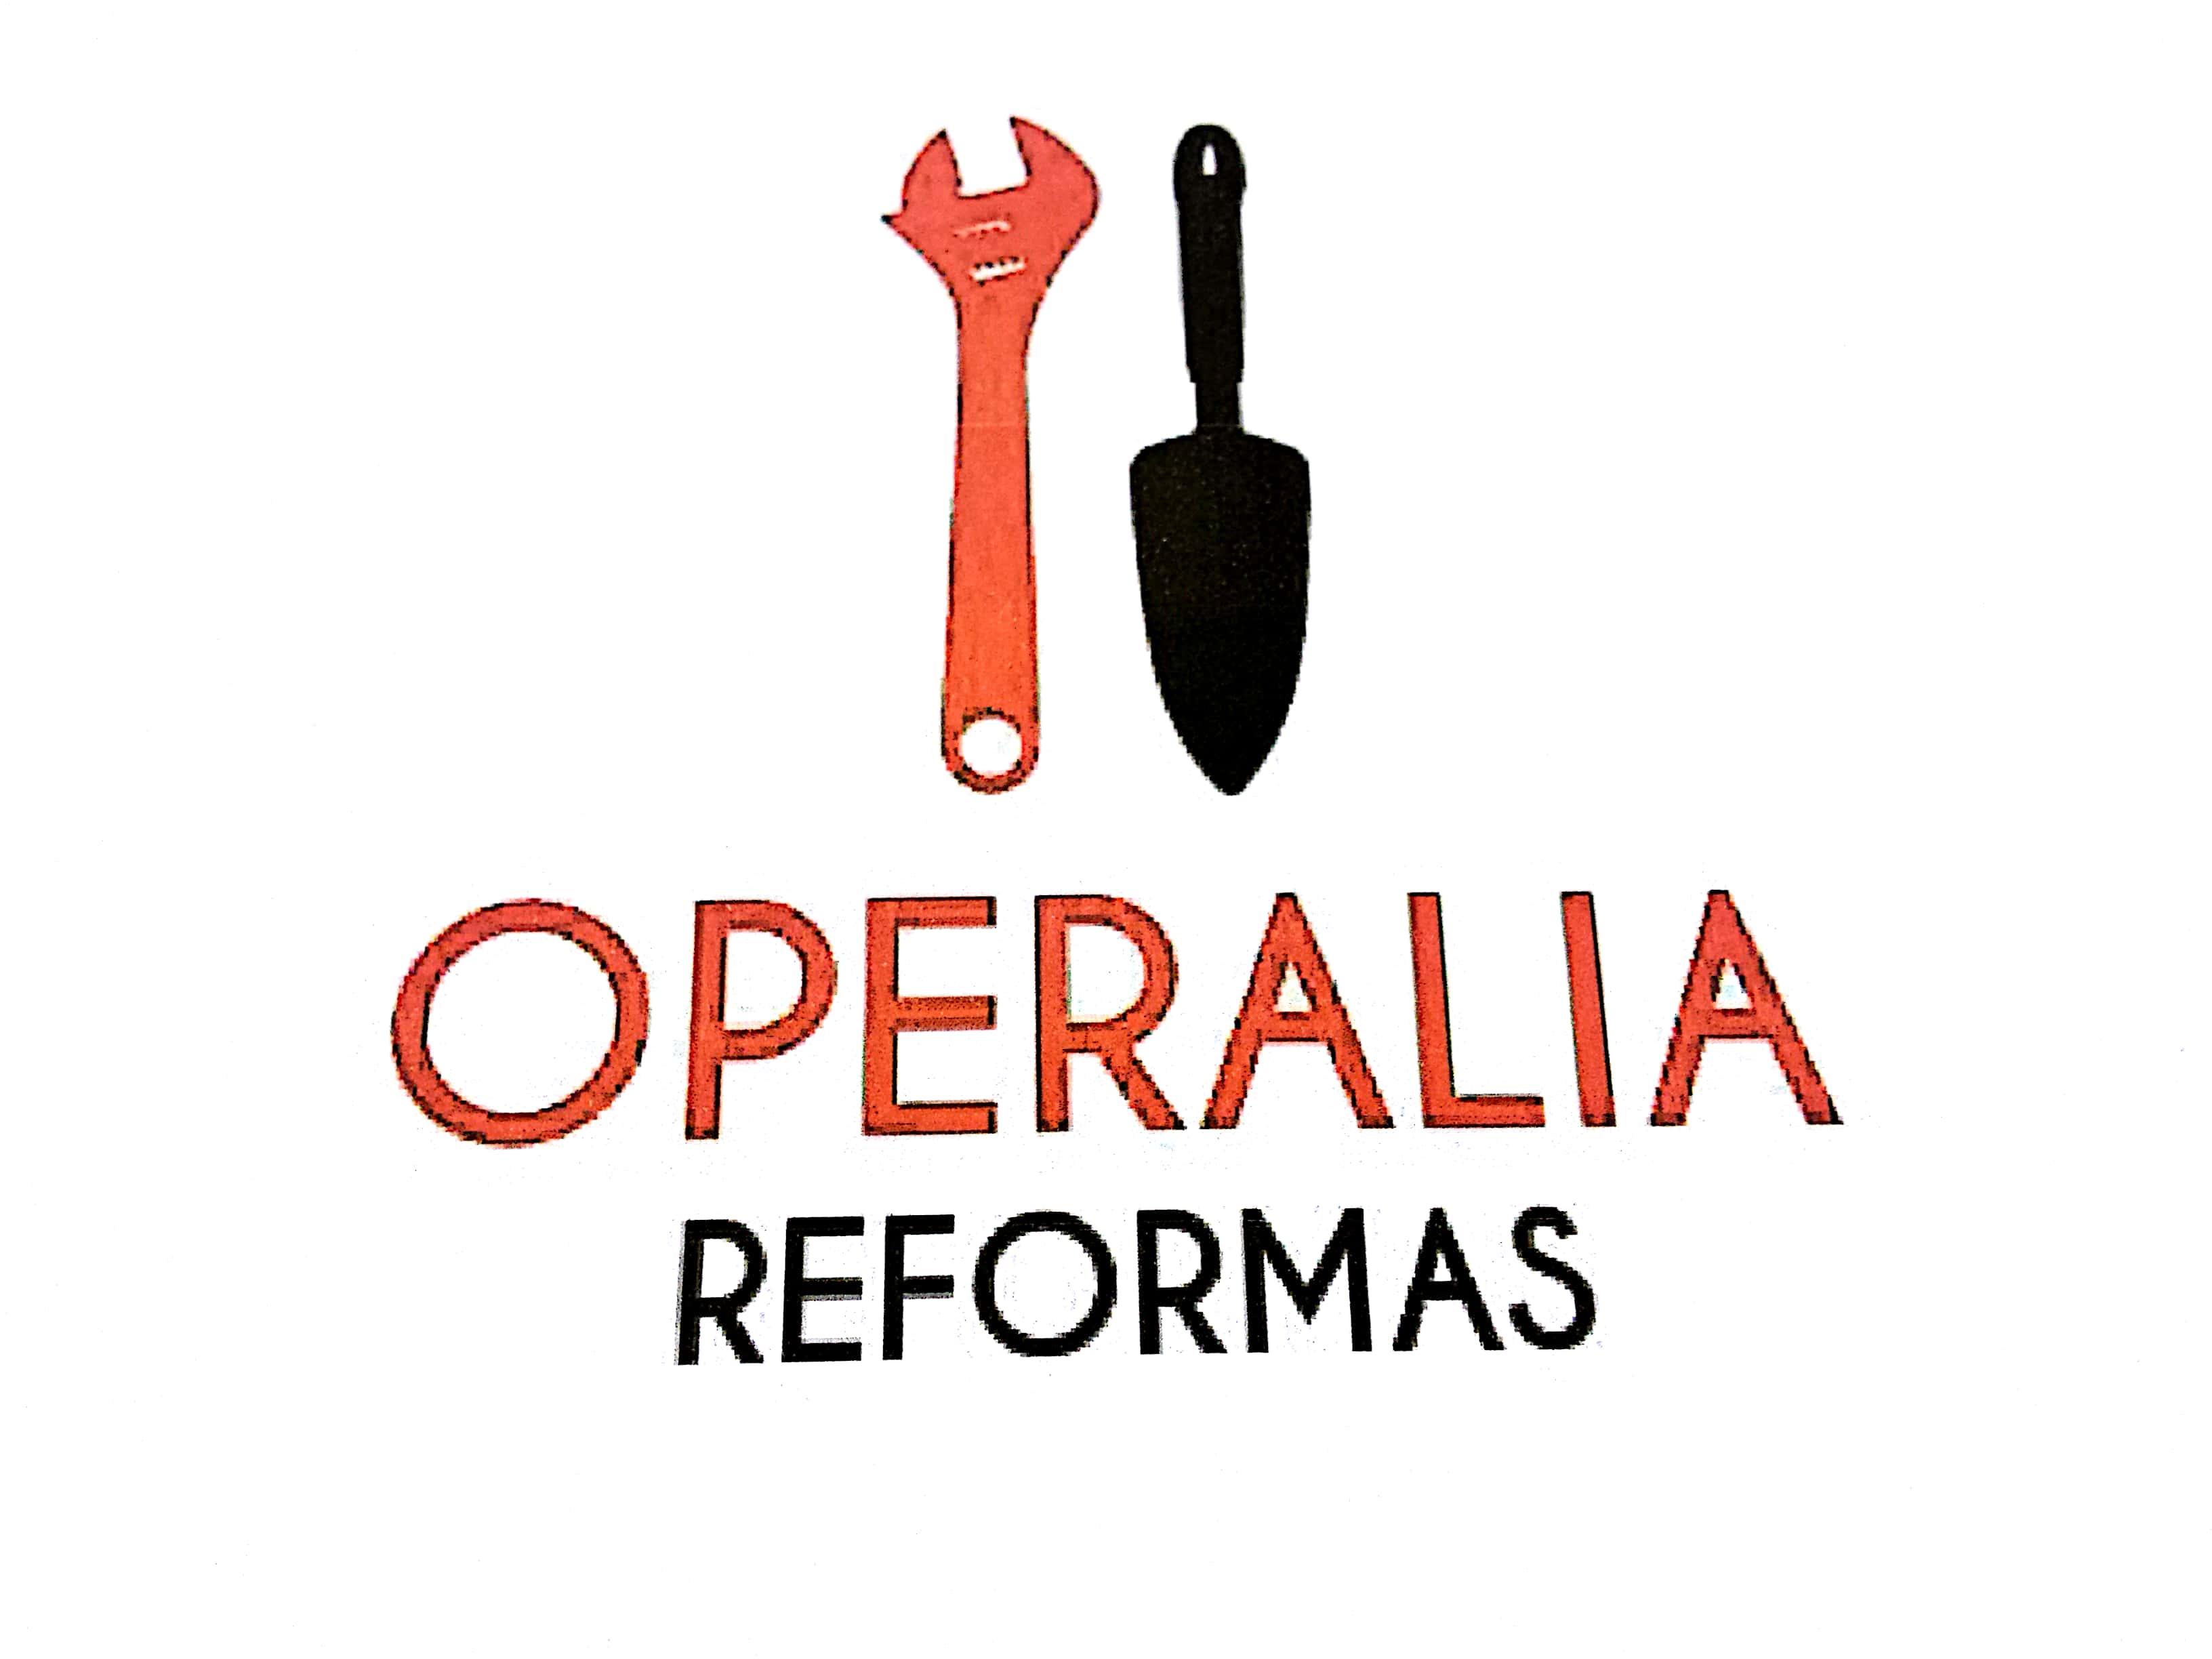 Operalia Reformas, S.L.